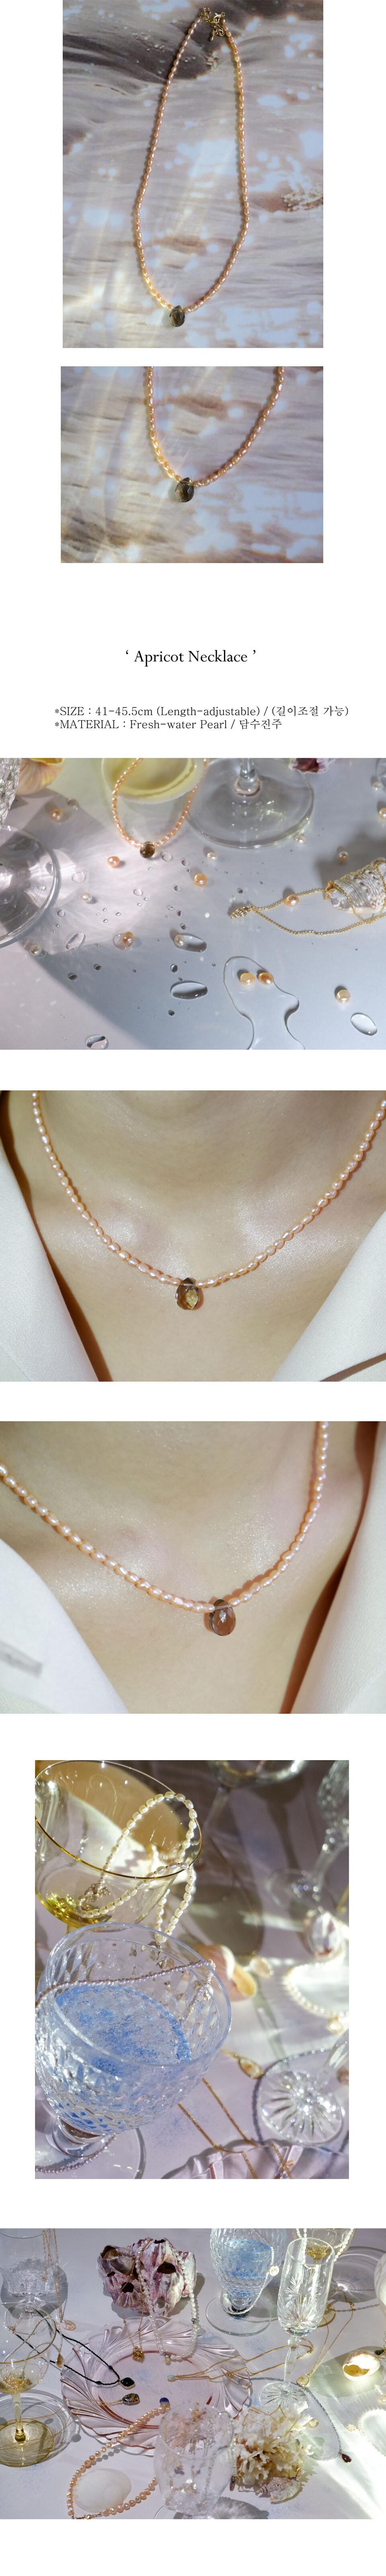 Apricot Necklace